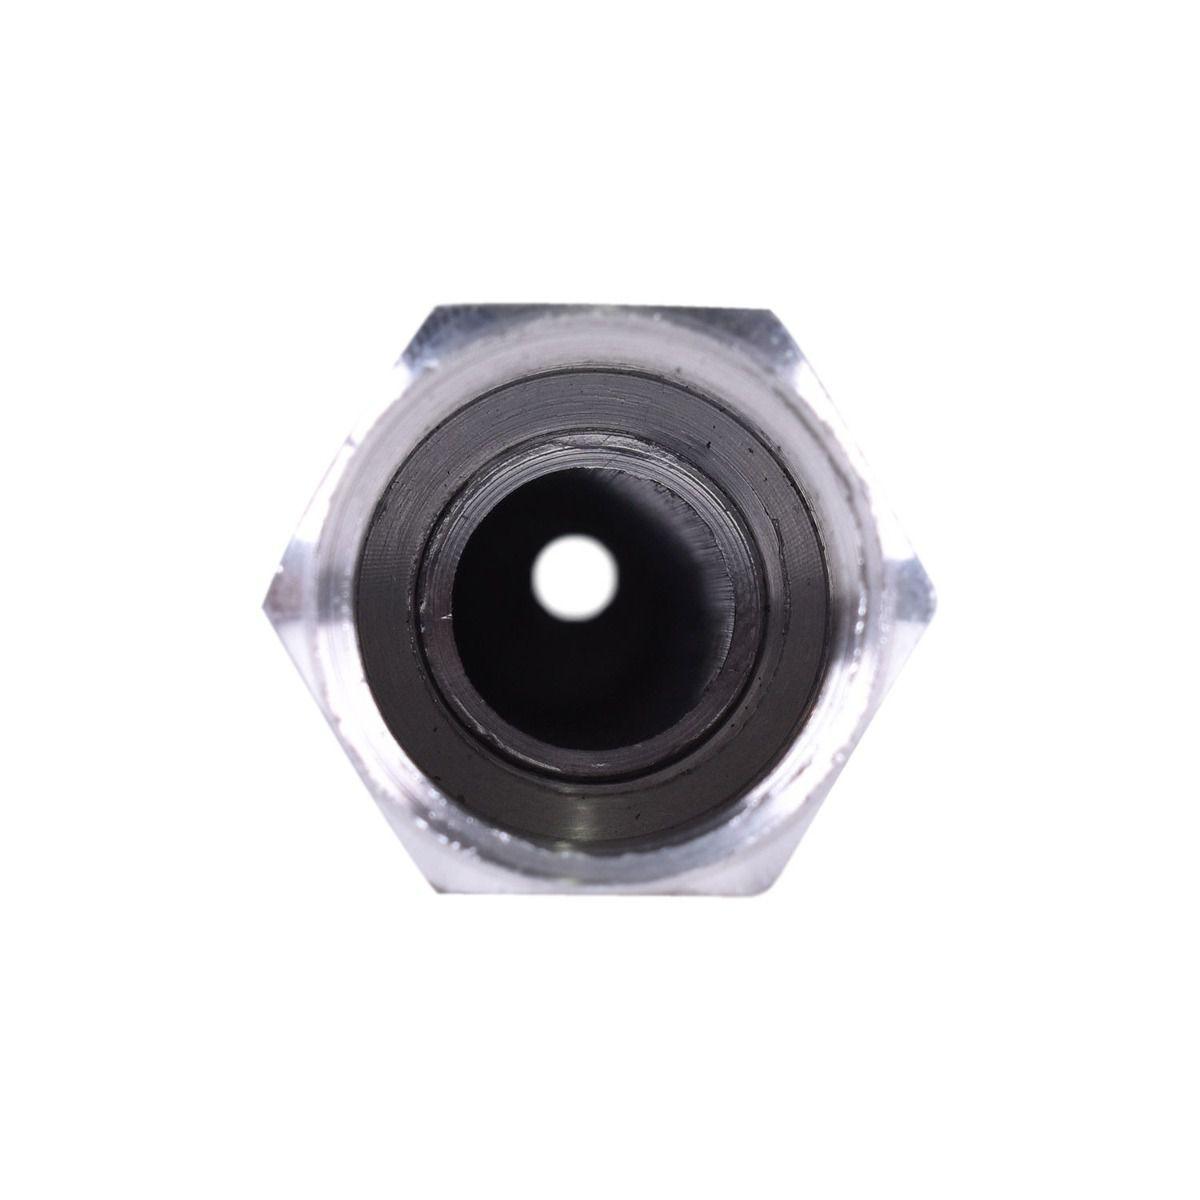 Bico Esguicho Longo Alta Pressão 160 mm - Schweers